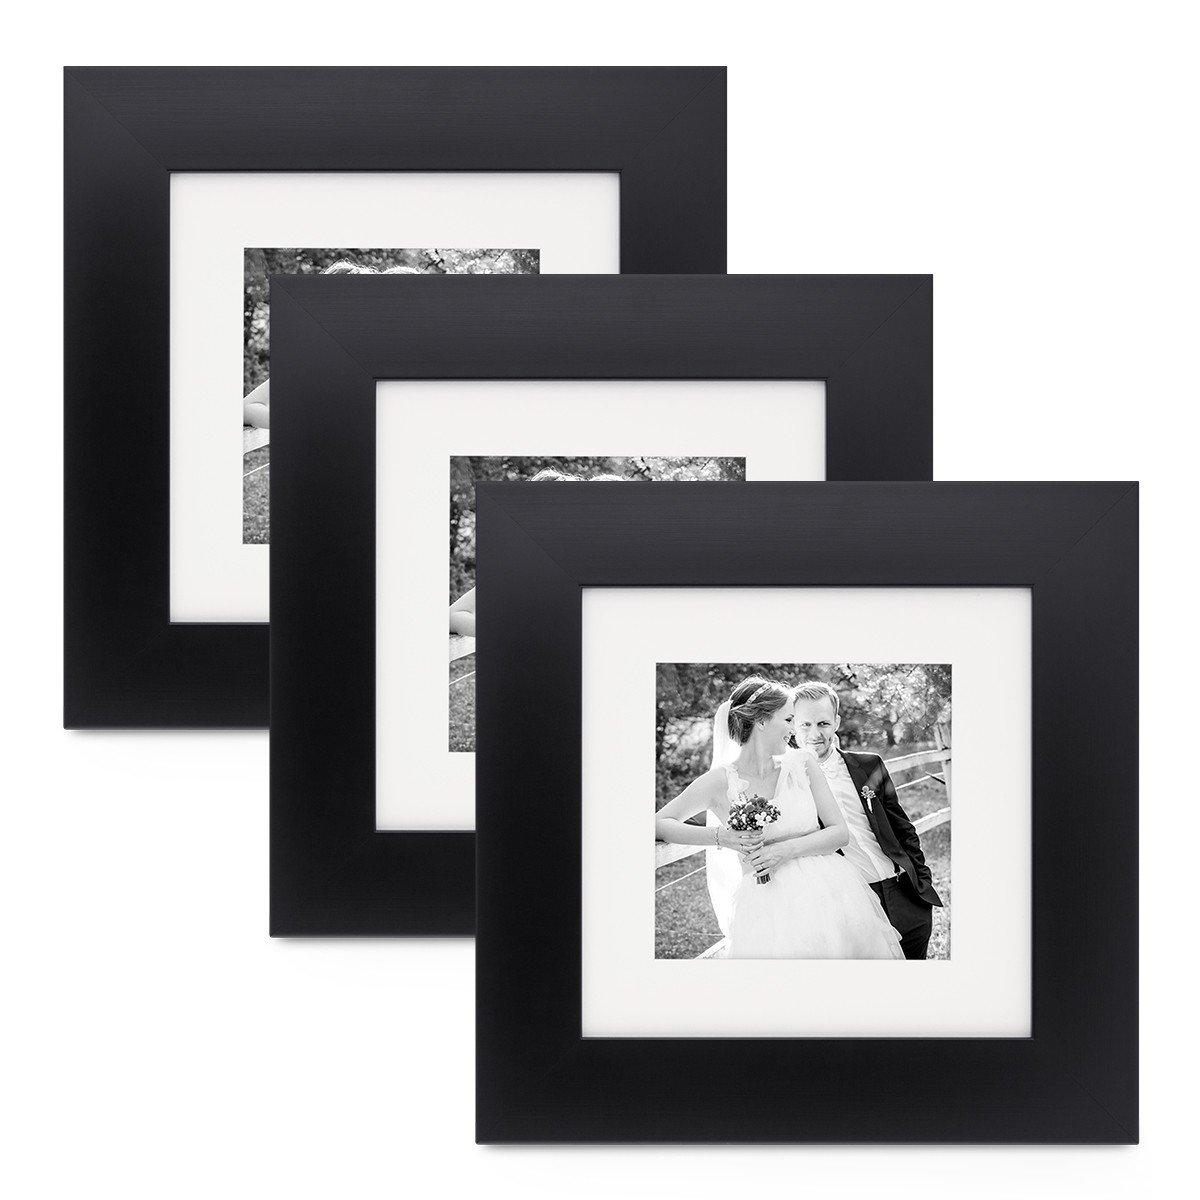 PHOTOLINI 3er Set Bilderrahmen 20x20 cm Schwarz Modern Breit aus MDF ...